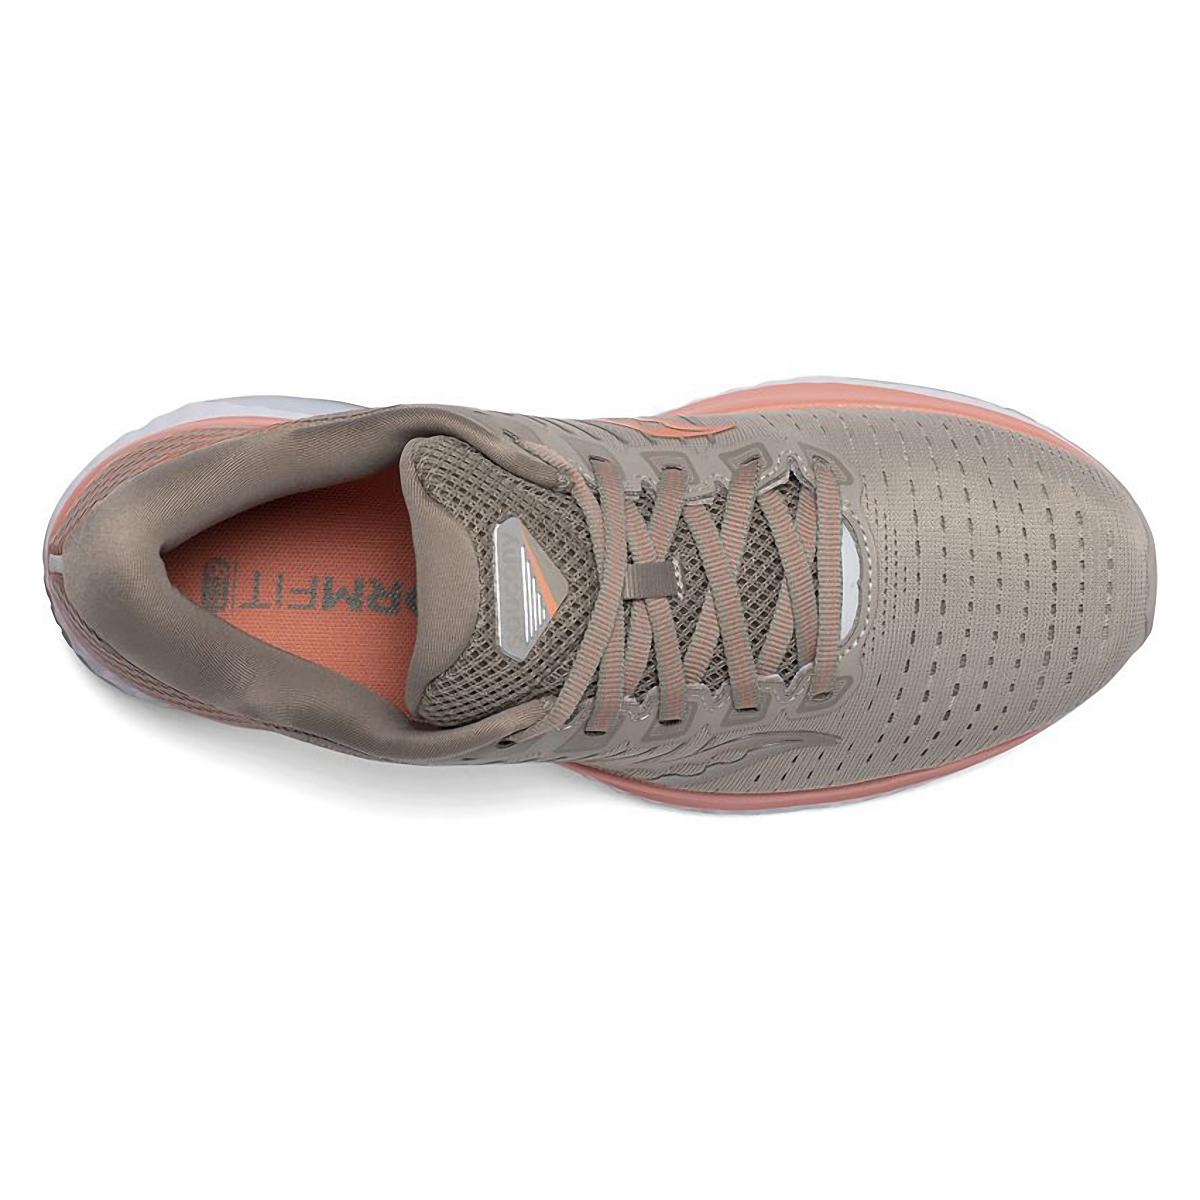 Women's Saucony Gude 13 Running Shoe - Color: Moonrock/Coral - Size: 5 - Width: Regular, Moonrock/Coral, large, image 3